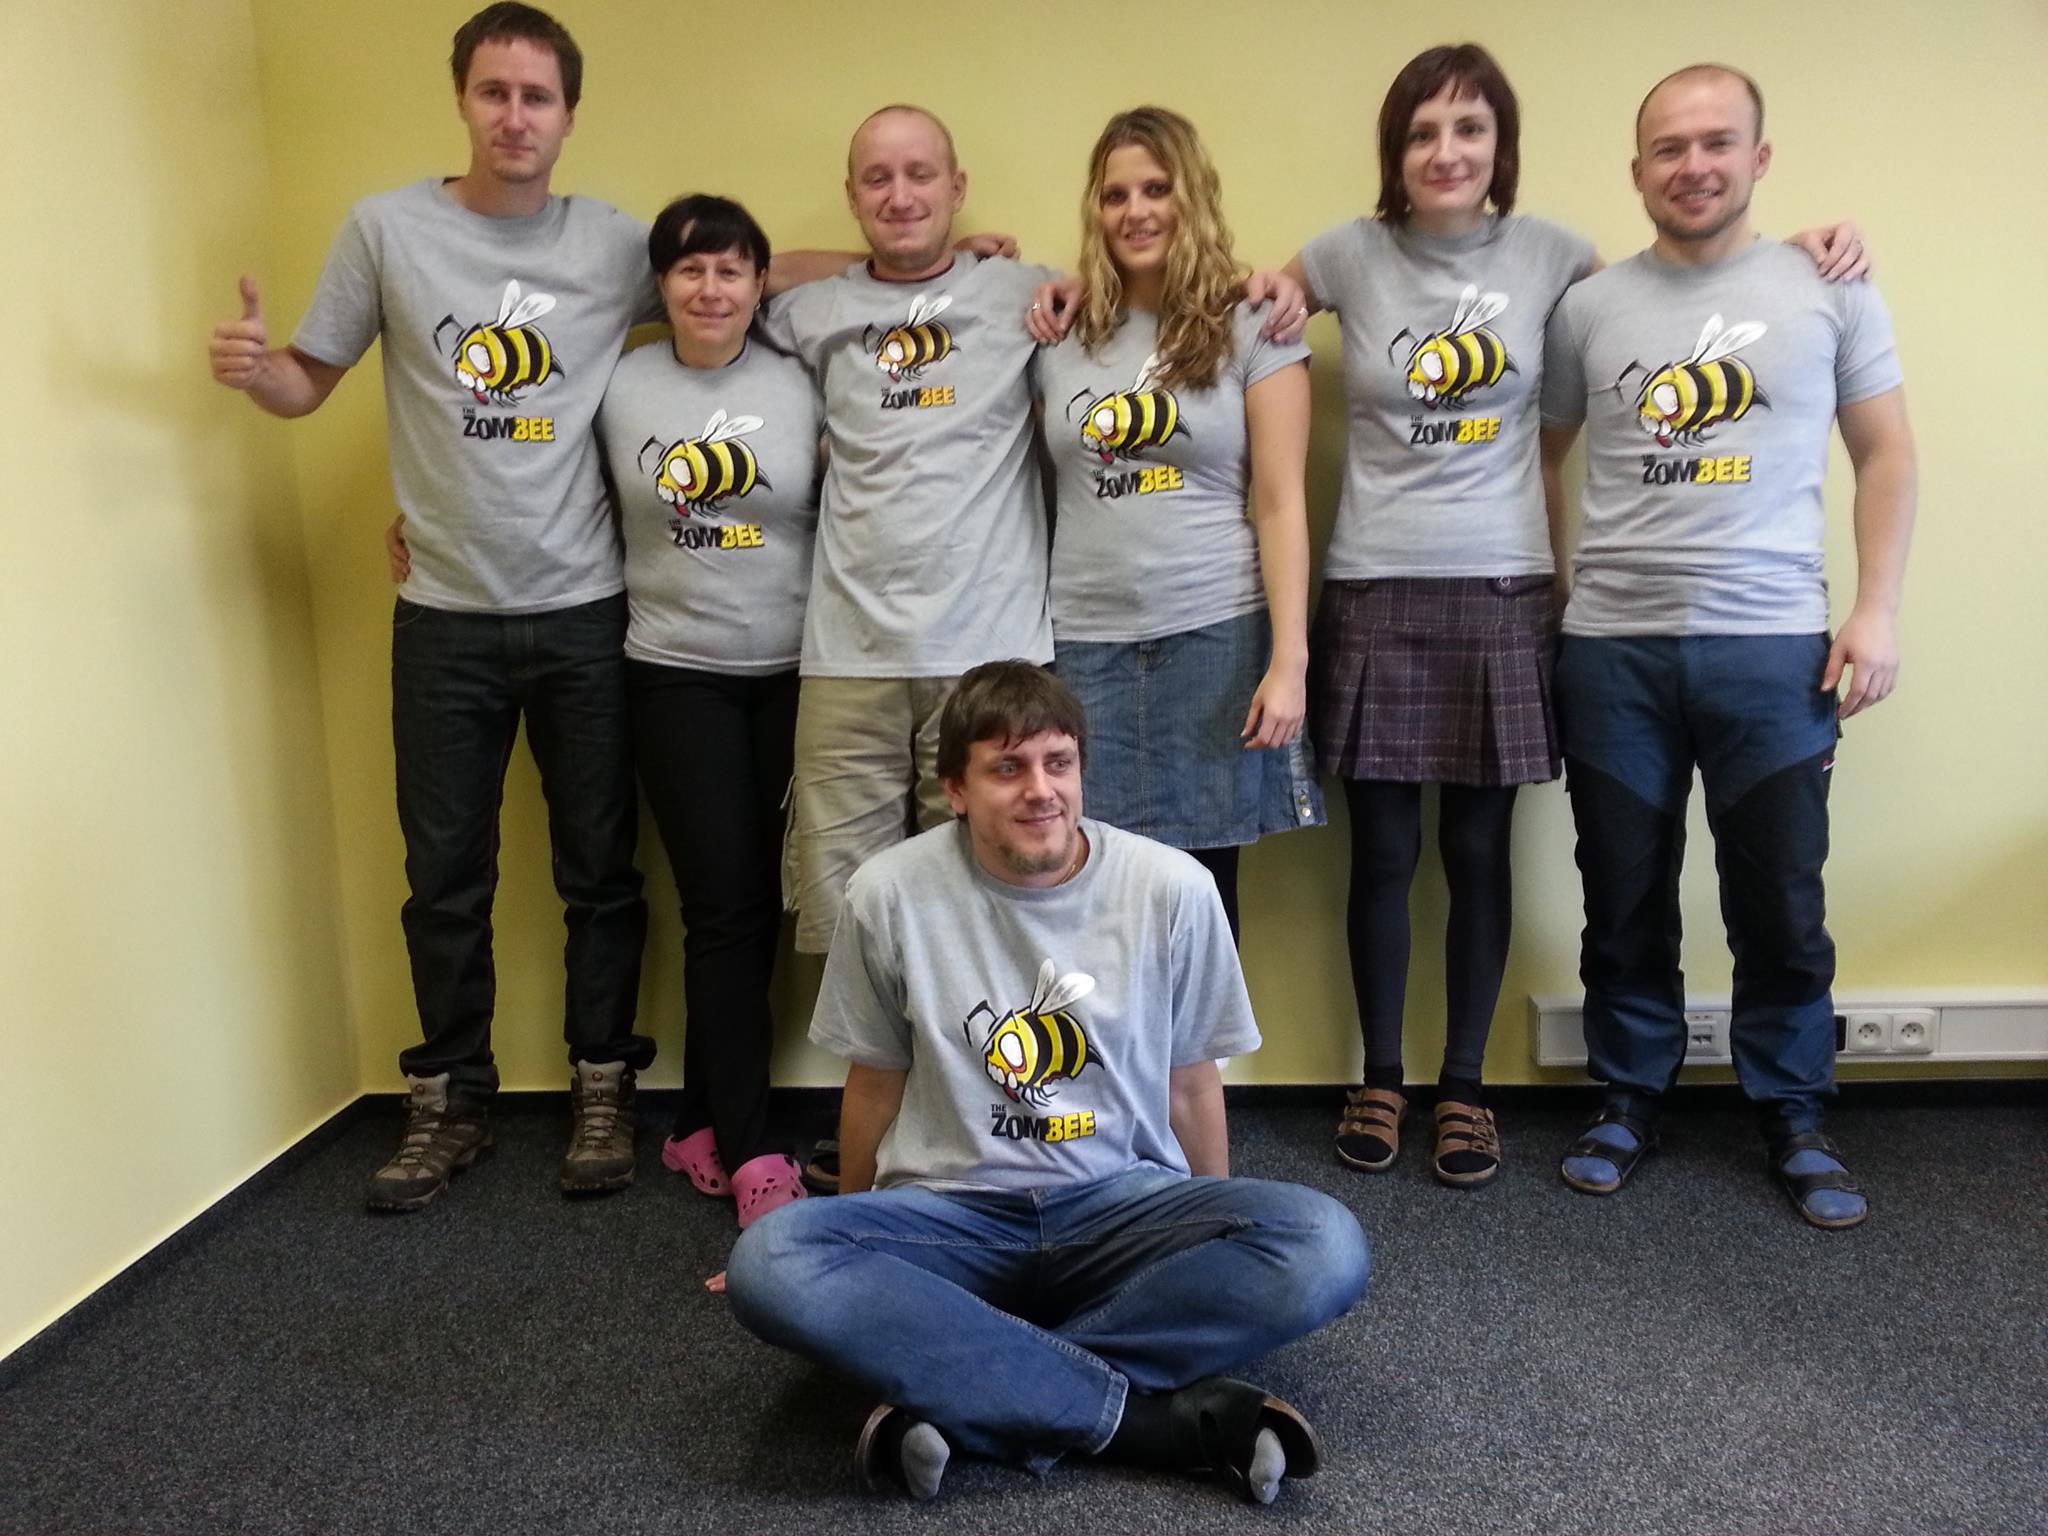 Zombees dream team :-)